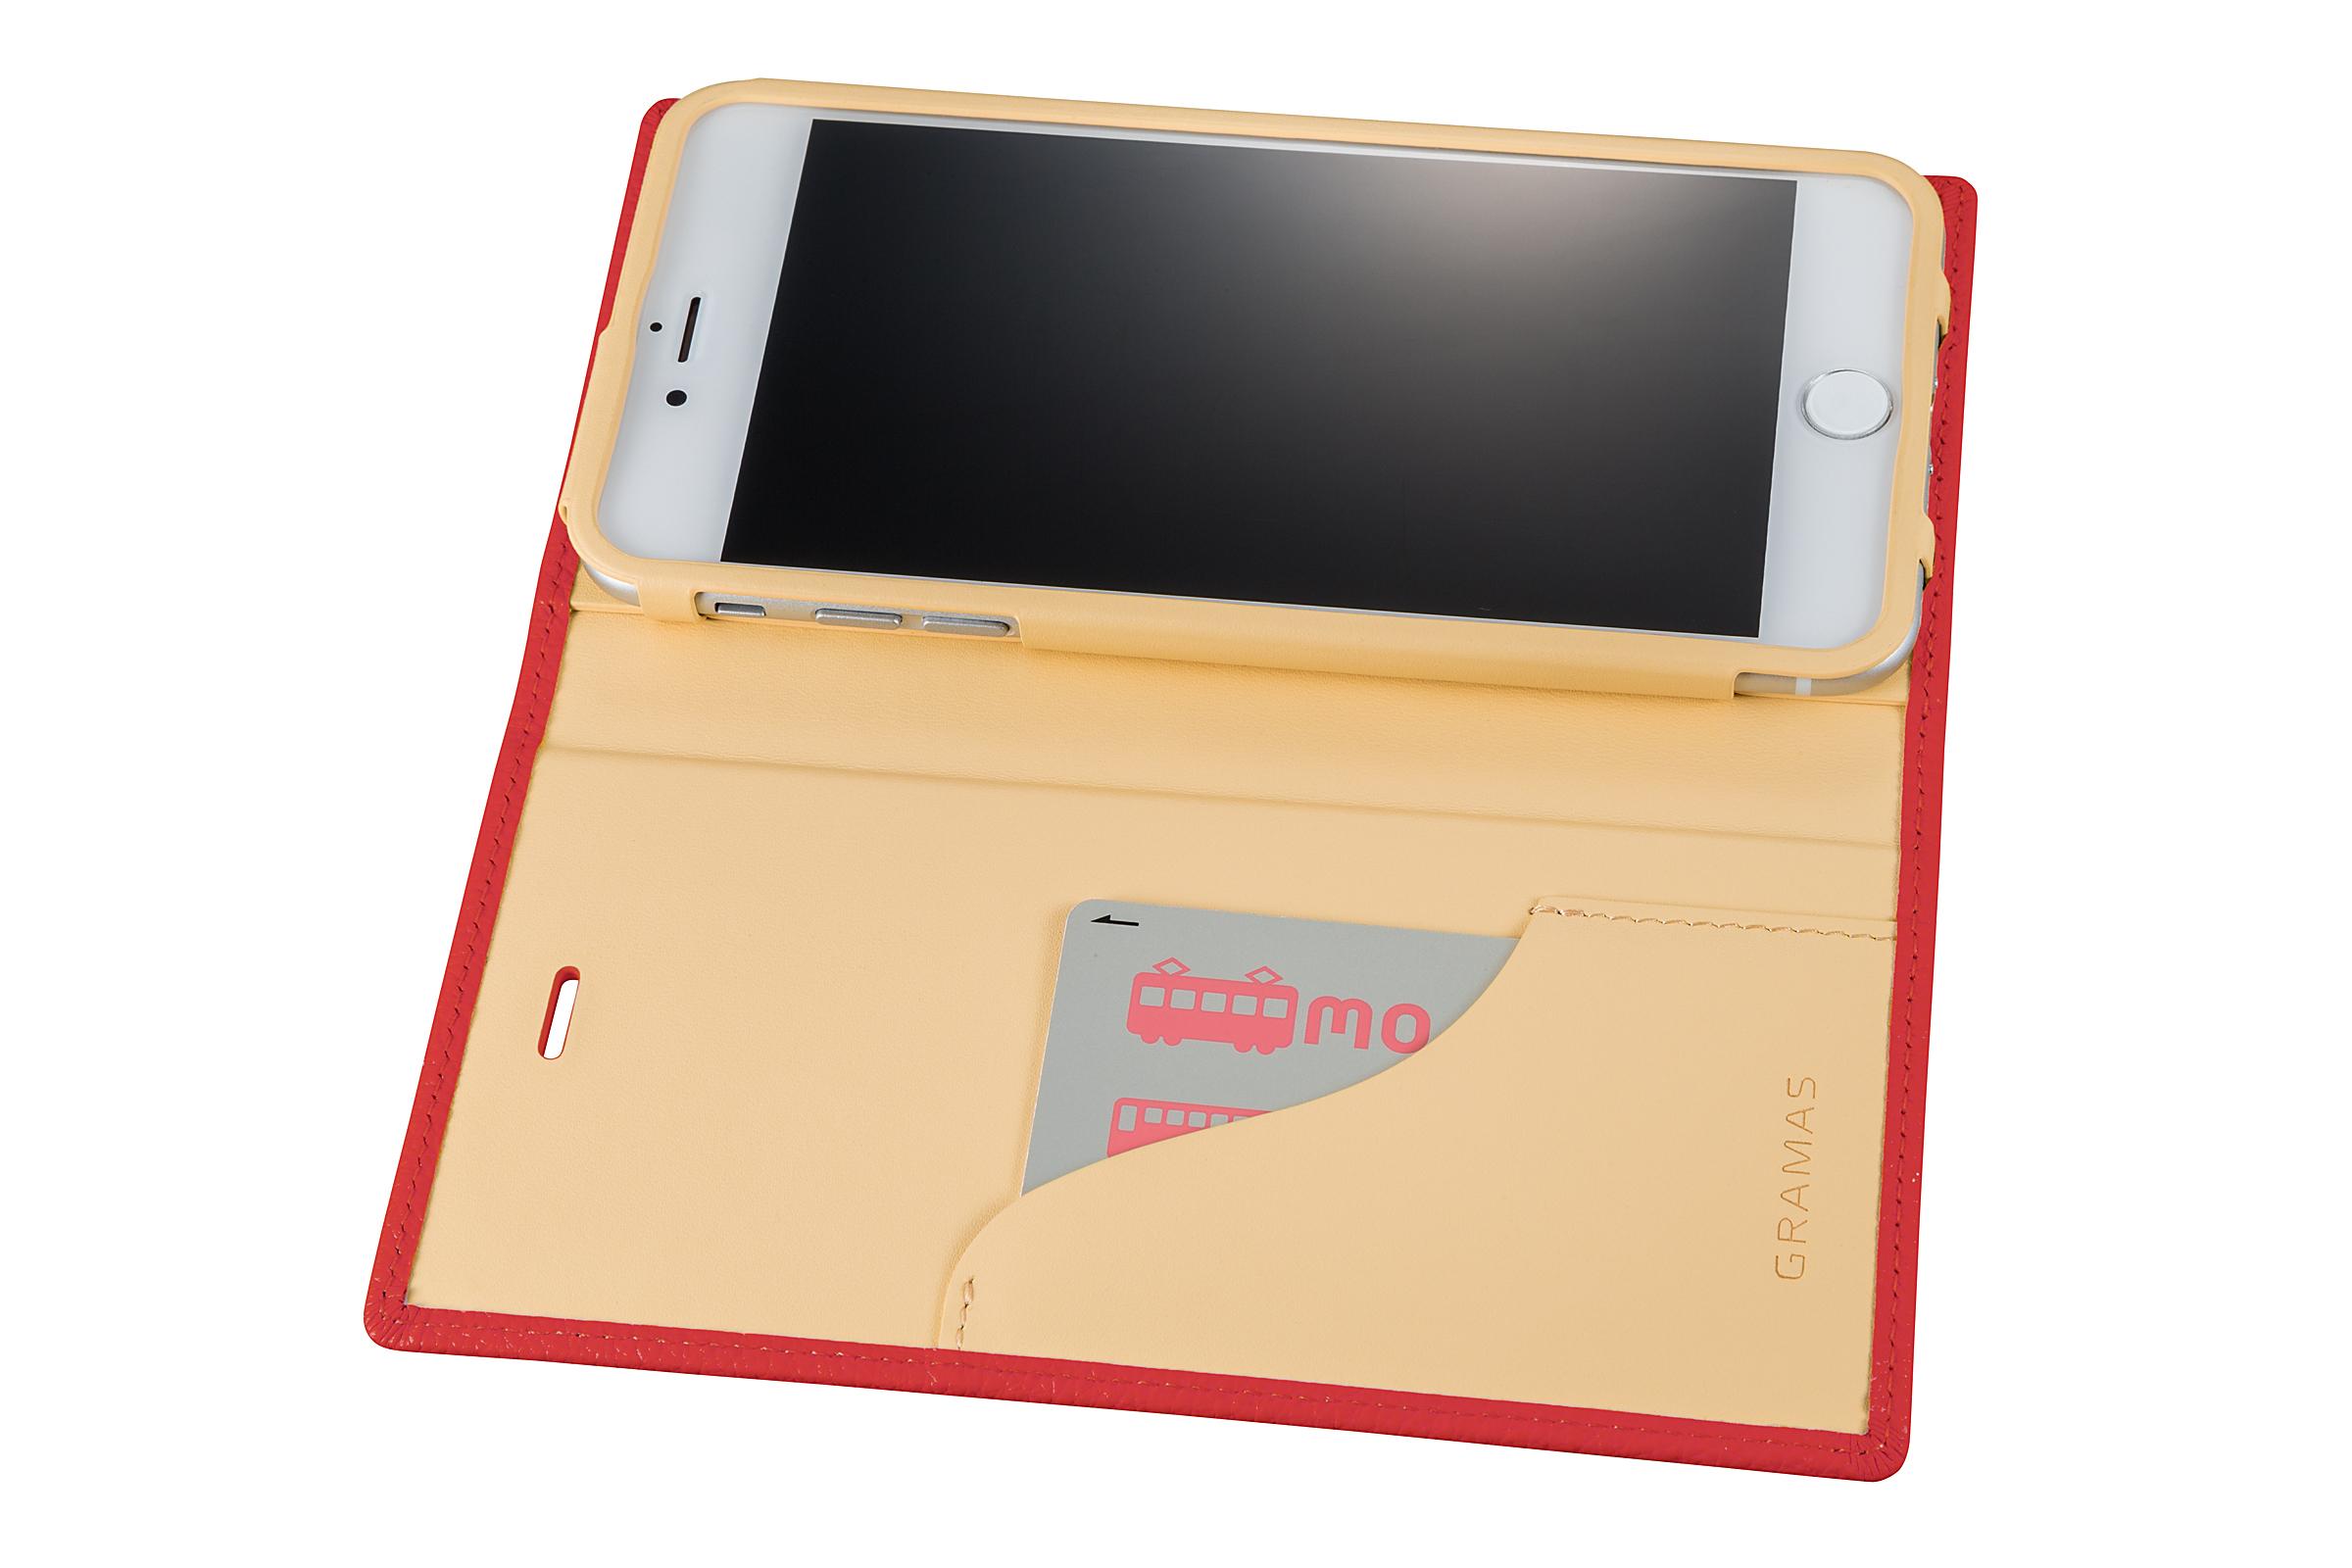 GRAMAS Shrunken-calf Full Leather Case for iPhone 7 Plus(Pink) シュランケンカーフ 手帳型フルレザーケース - 画像4